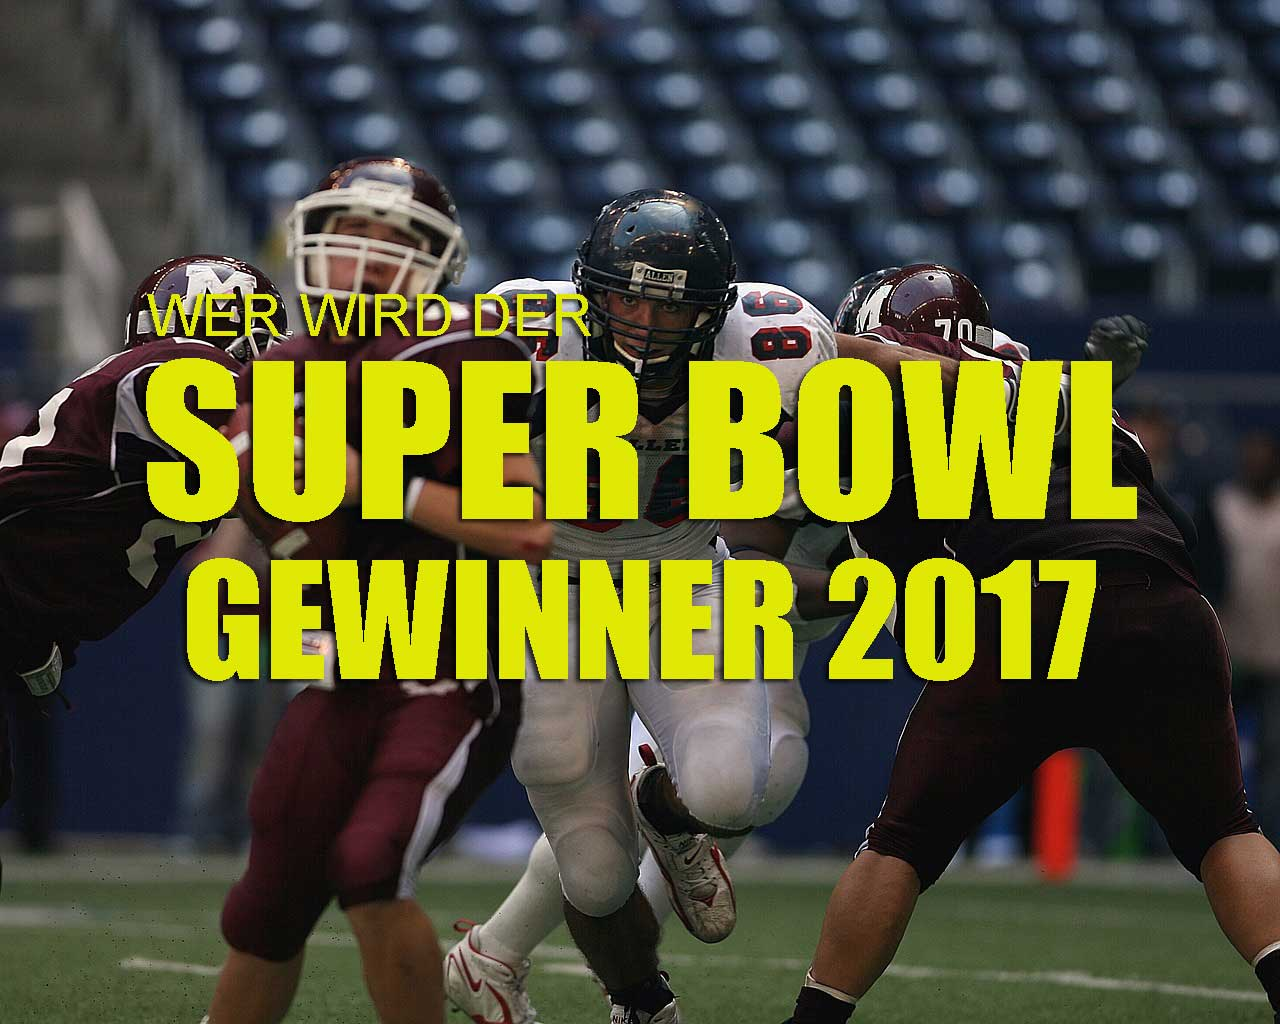 super bowl gewinner 2017